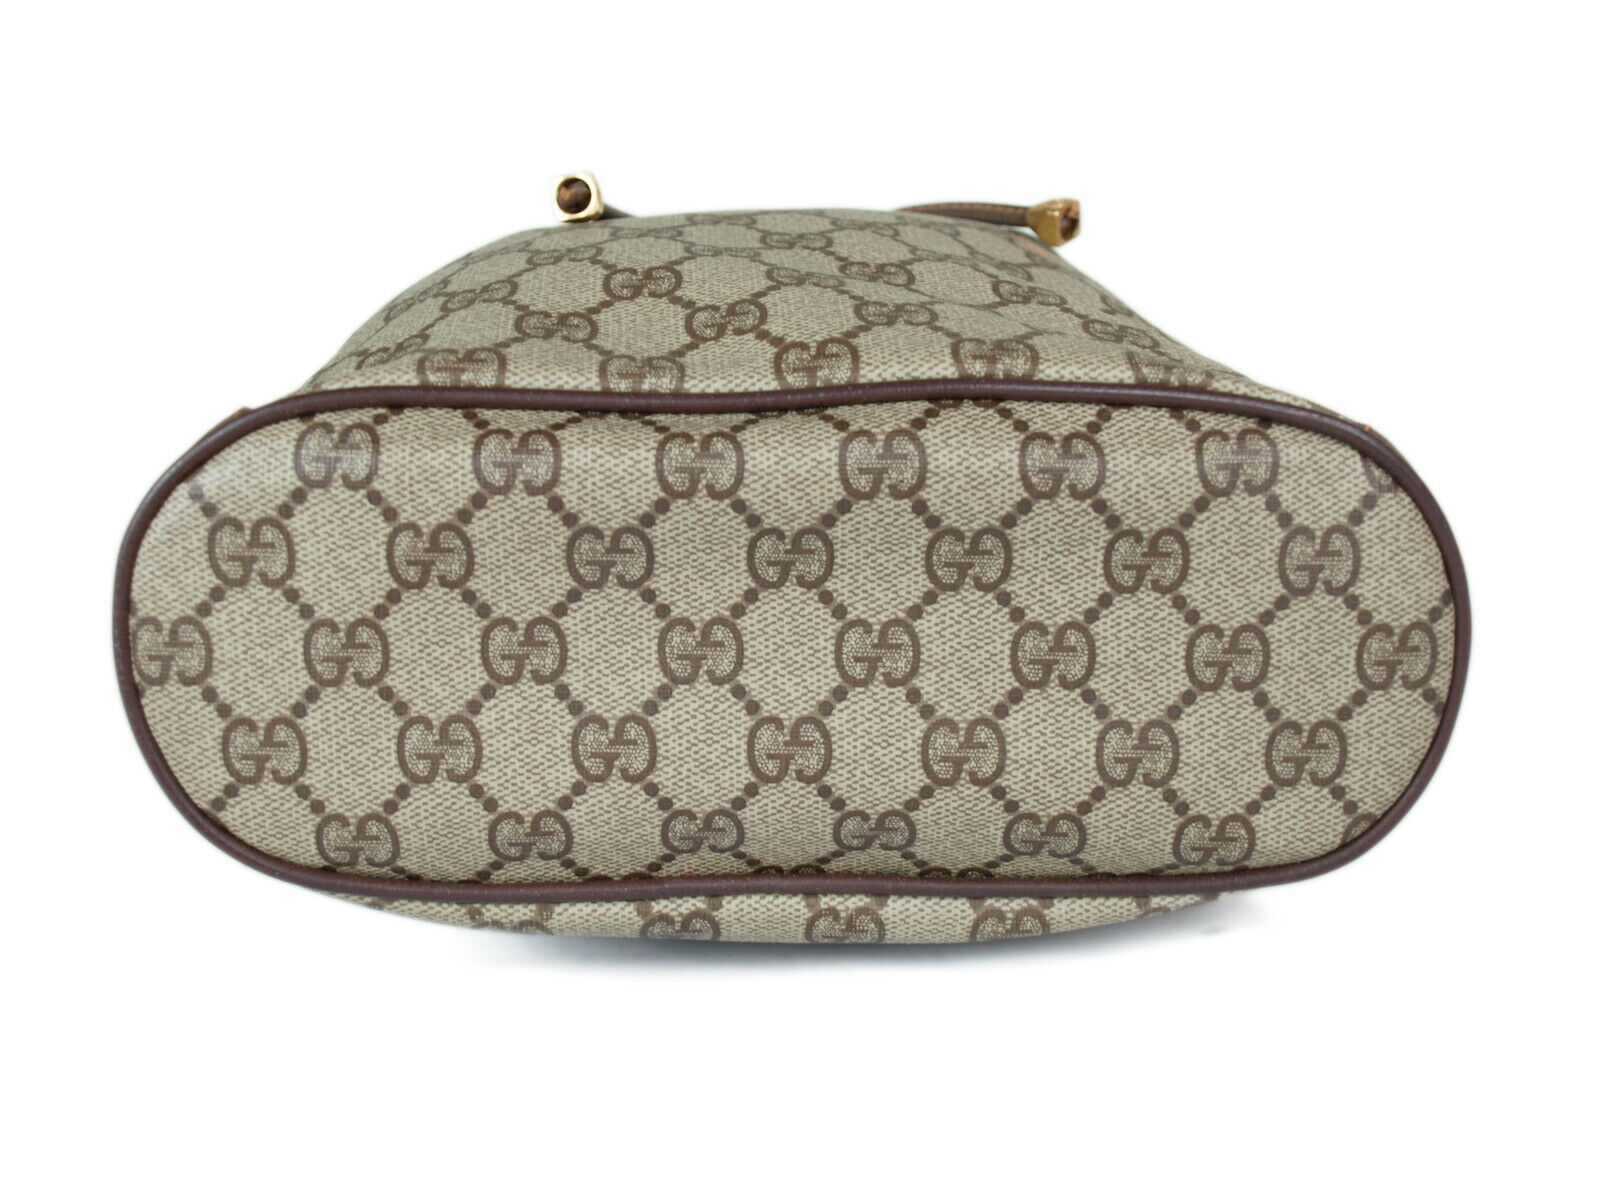 GUCCI GG Web PVC Canvas Leather Browns Drawstring Shoulder Bag GS2171 image 4